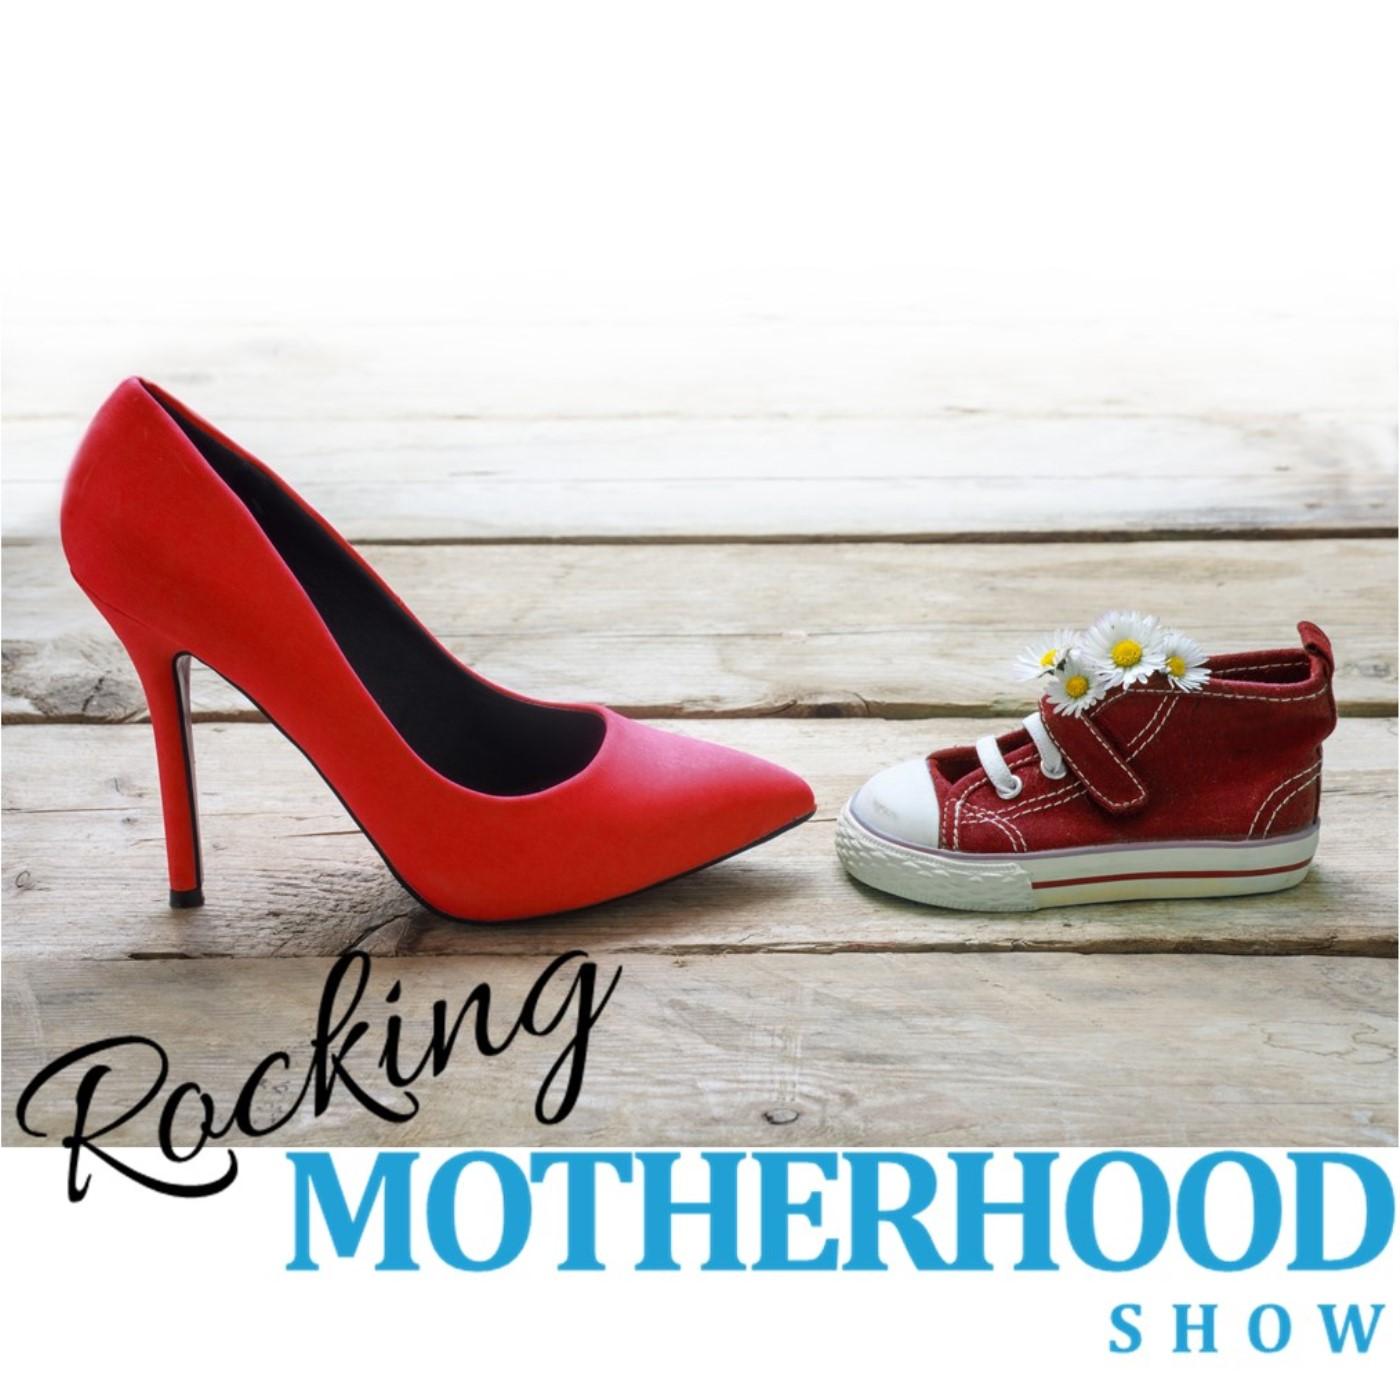 The Rocking Motherhood Show